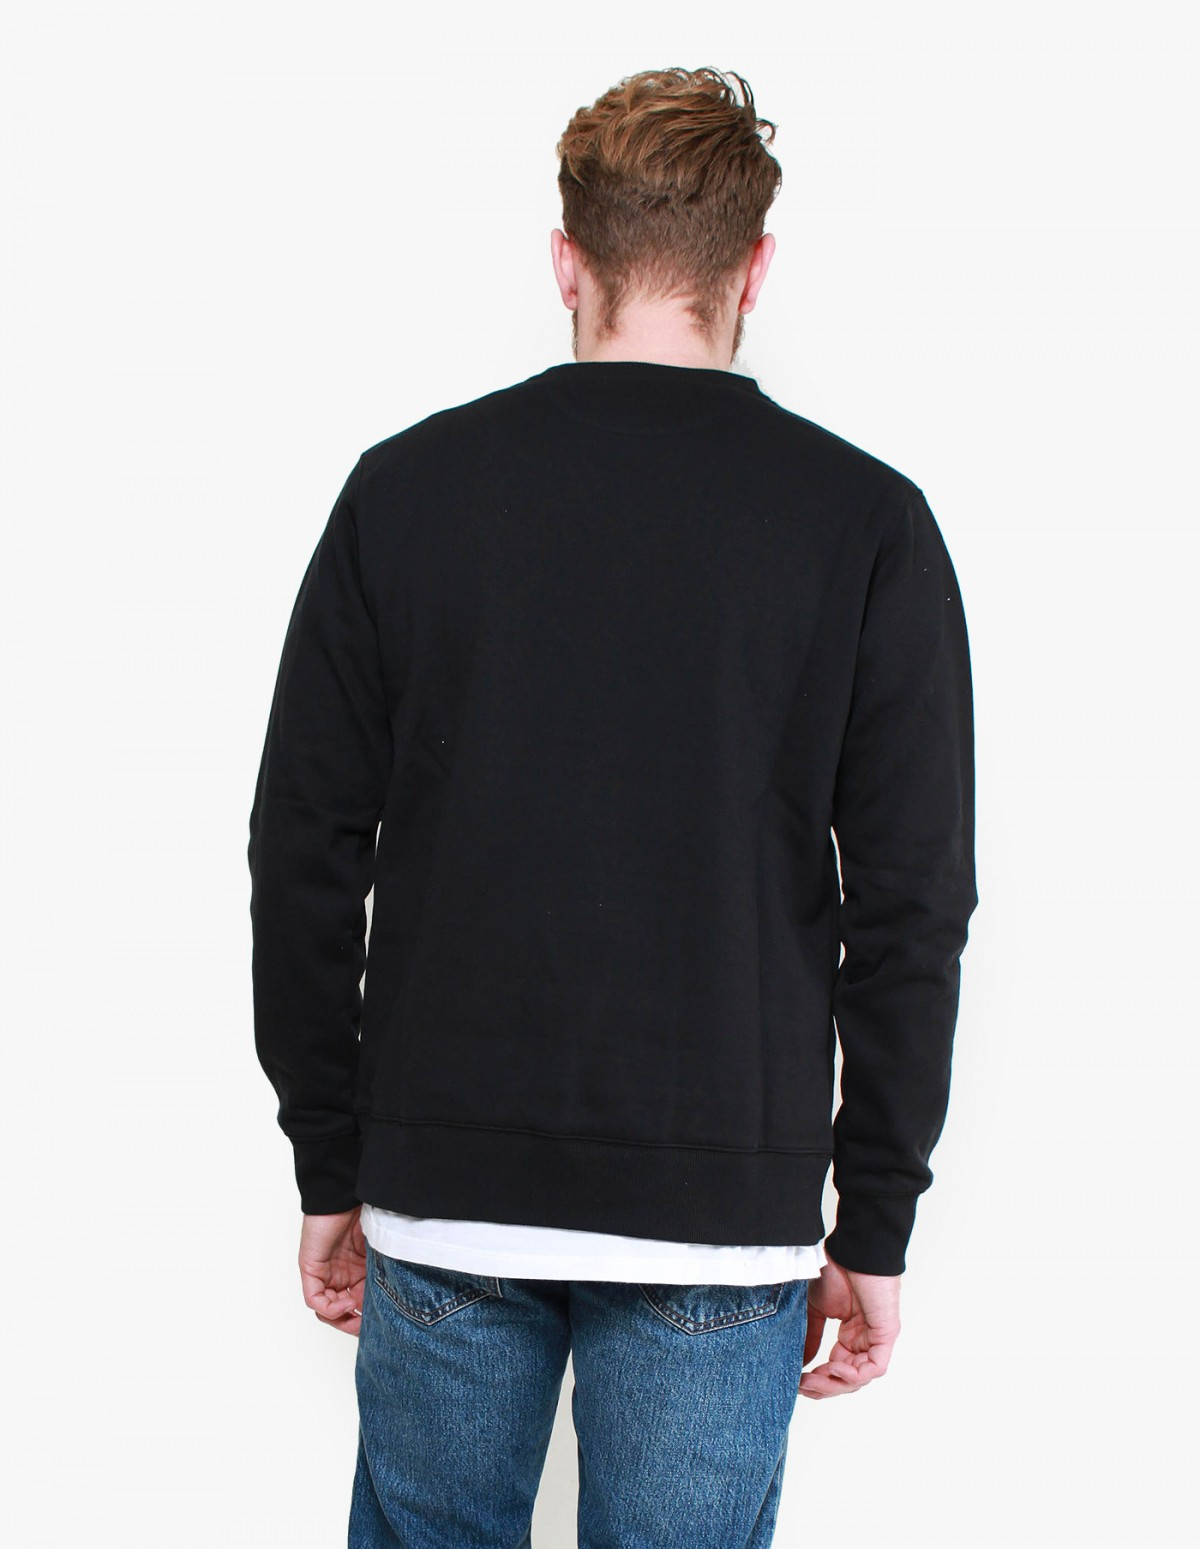 Penfield Kendrick Crew in Black